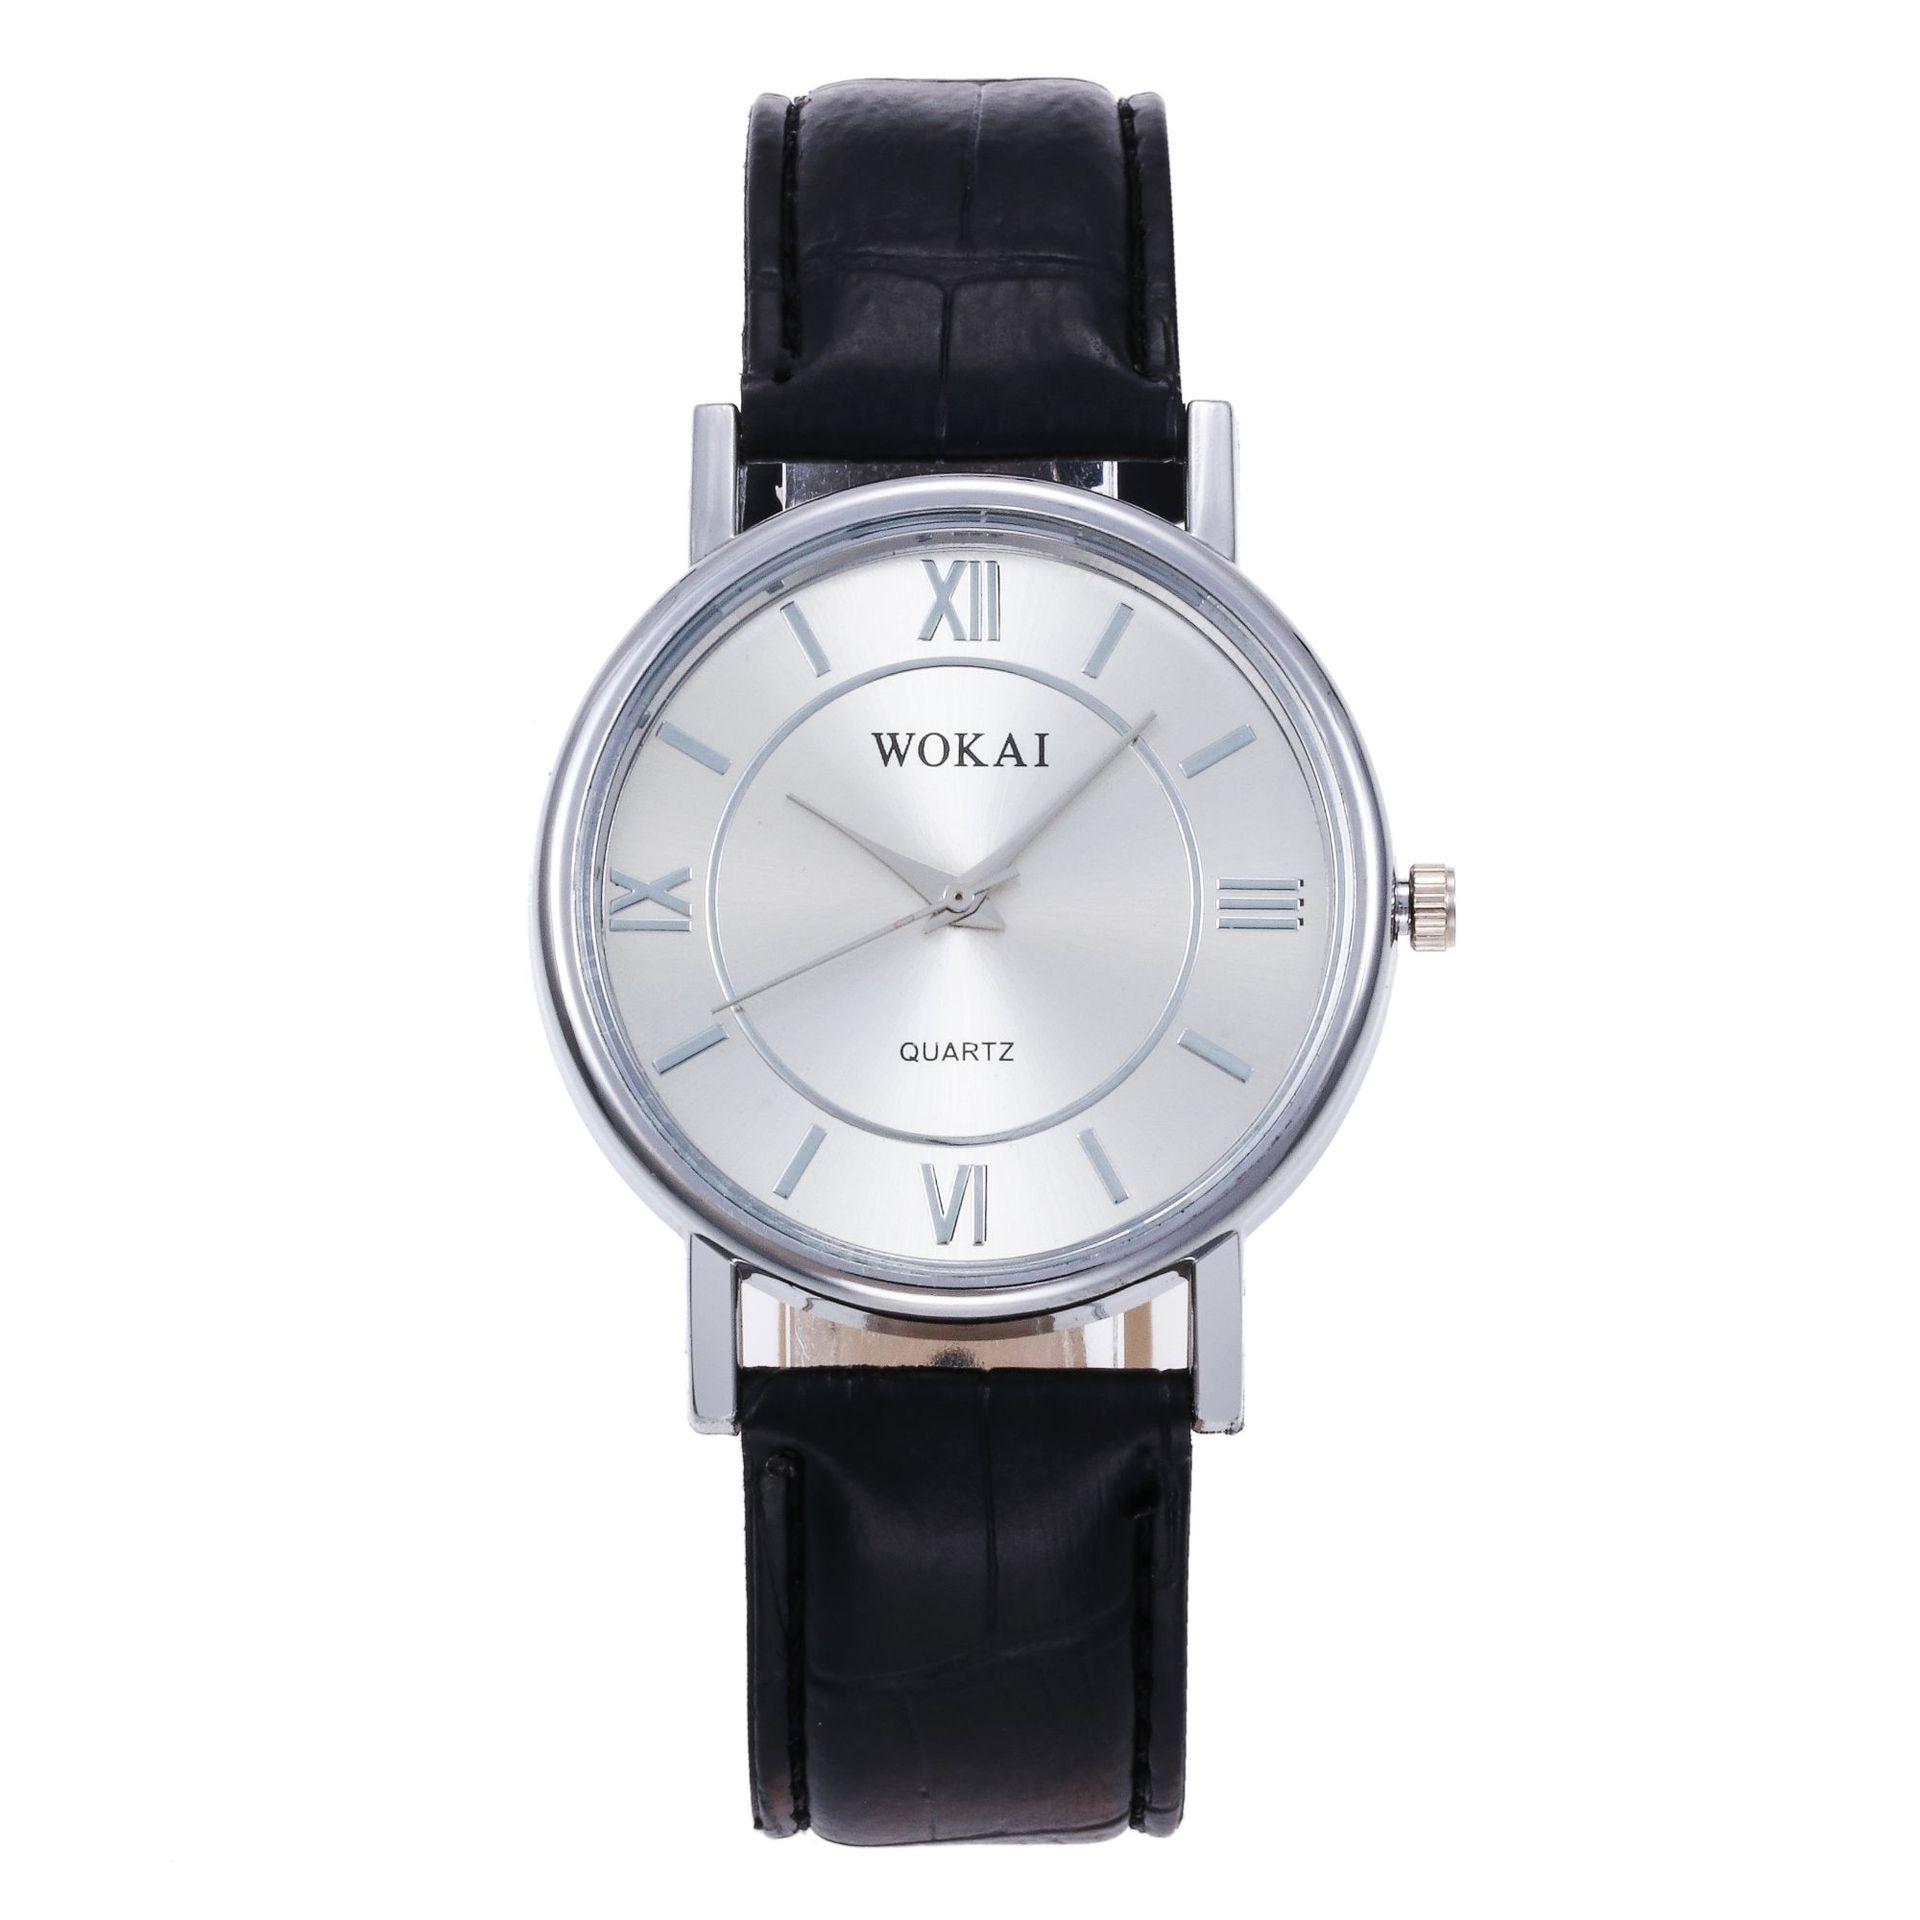 Quartz Watch Fashionable casual strap watch Scale wokai Dial Waterproof Reverse Watch Leather Boy St